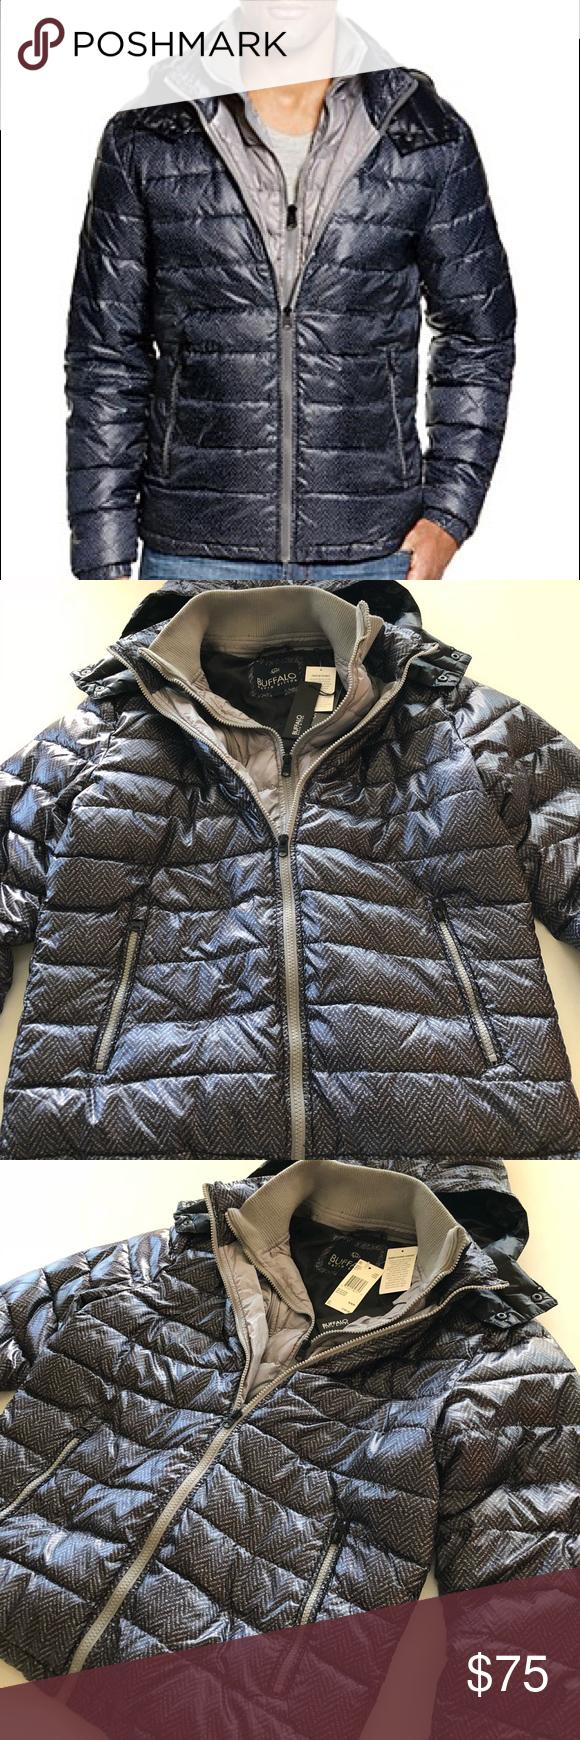 New Buffalo David Bitton Puffer Jacket Clothes Design Jackets Puffer Jackets [ 1740 x 580 Pixel ]